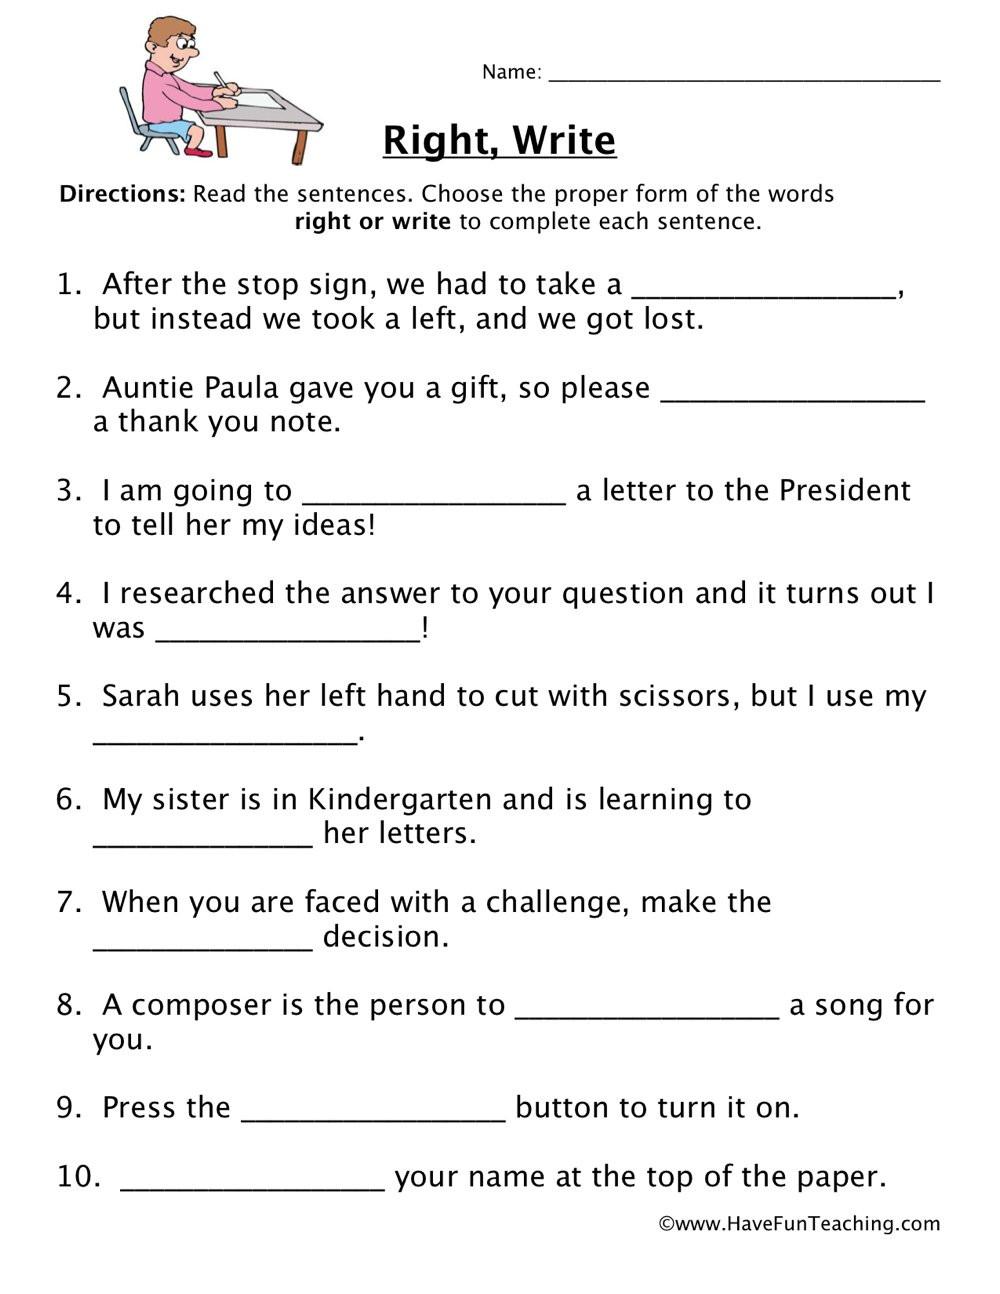 Homophones Worksheets 2nd Grade Right Write Homophones Worksheet